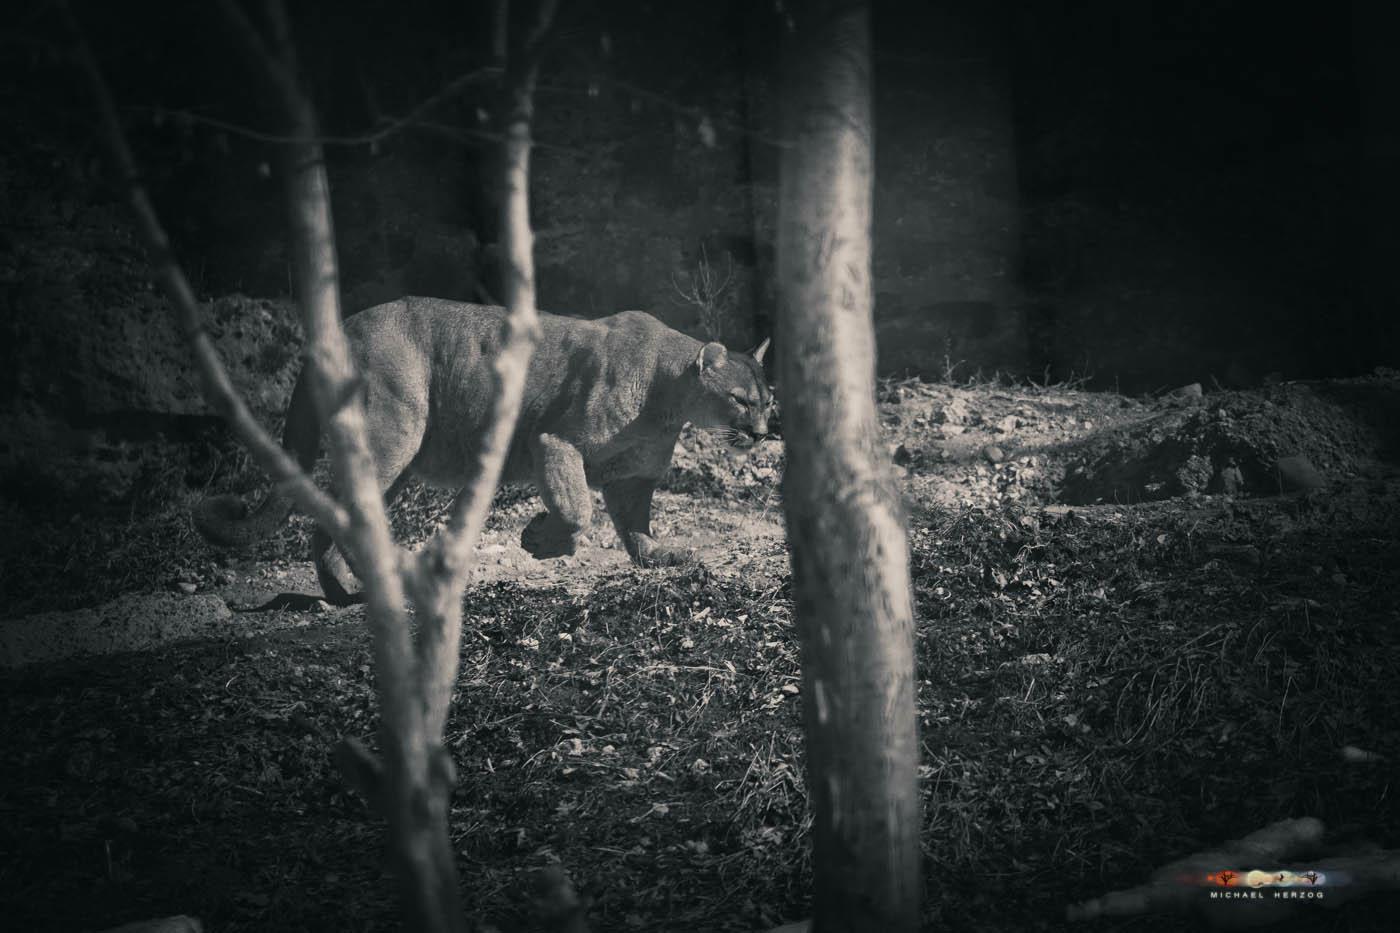 Zoo_Salzburg_MichaelHerzog-7181.jpg